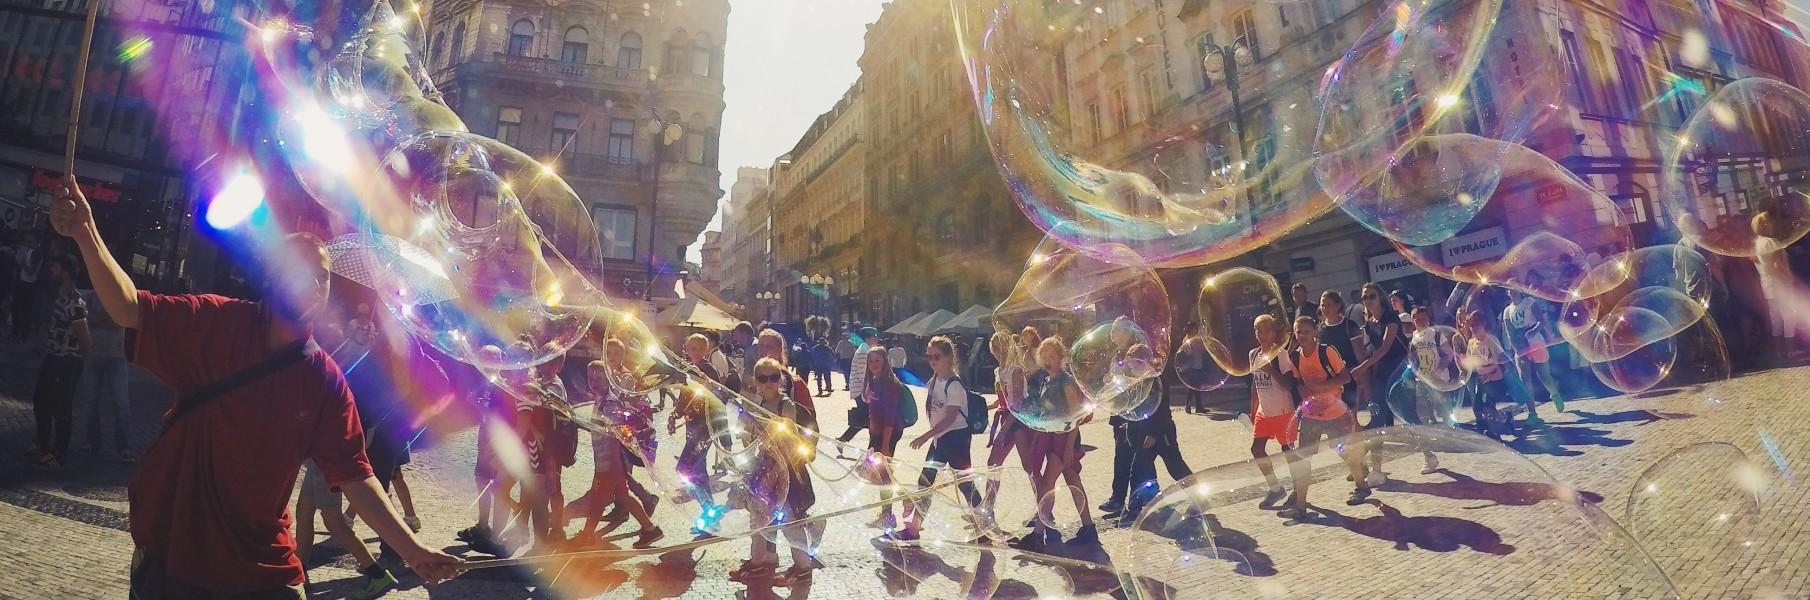 Image of Bubbles across street